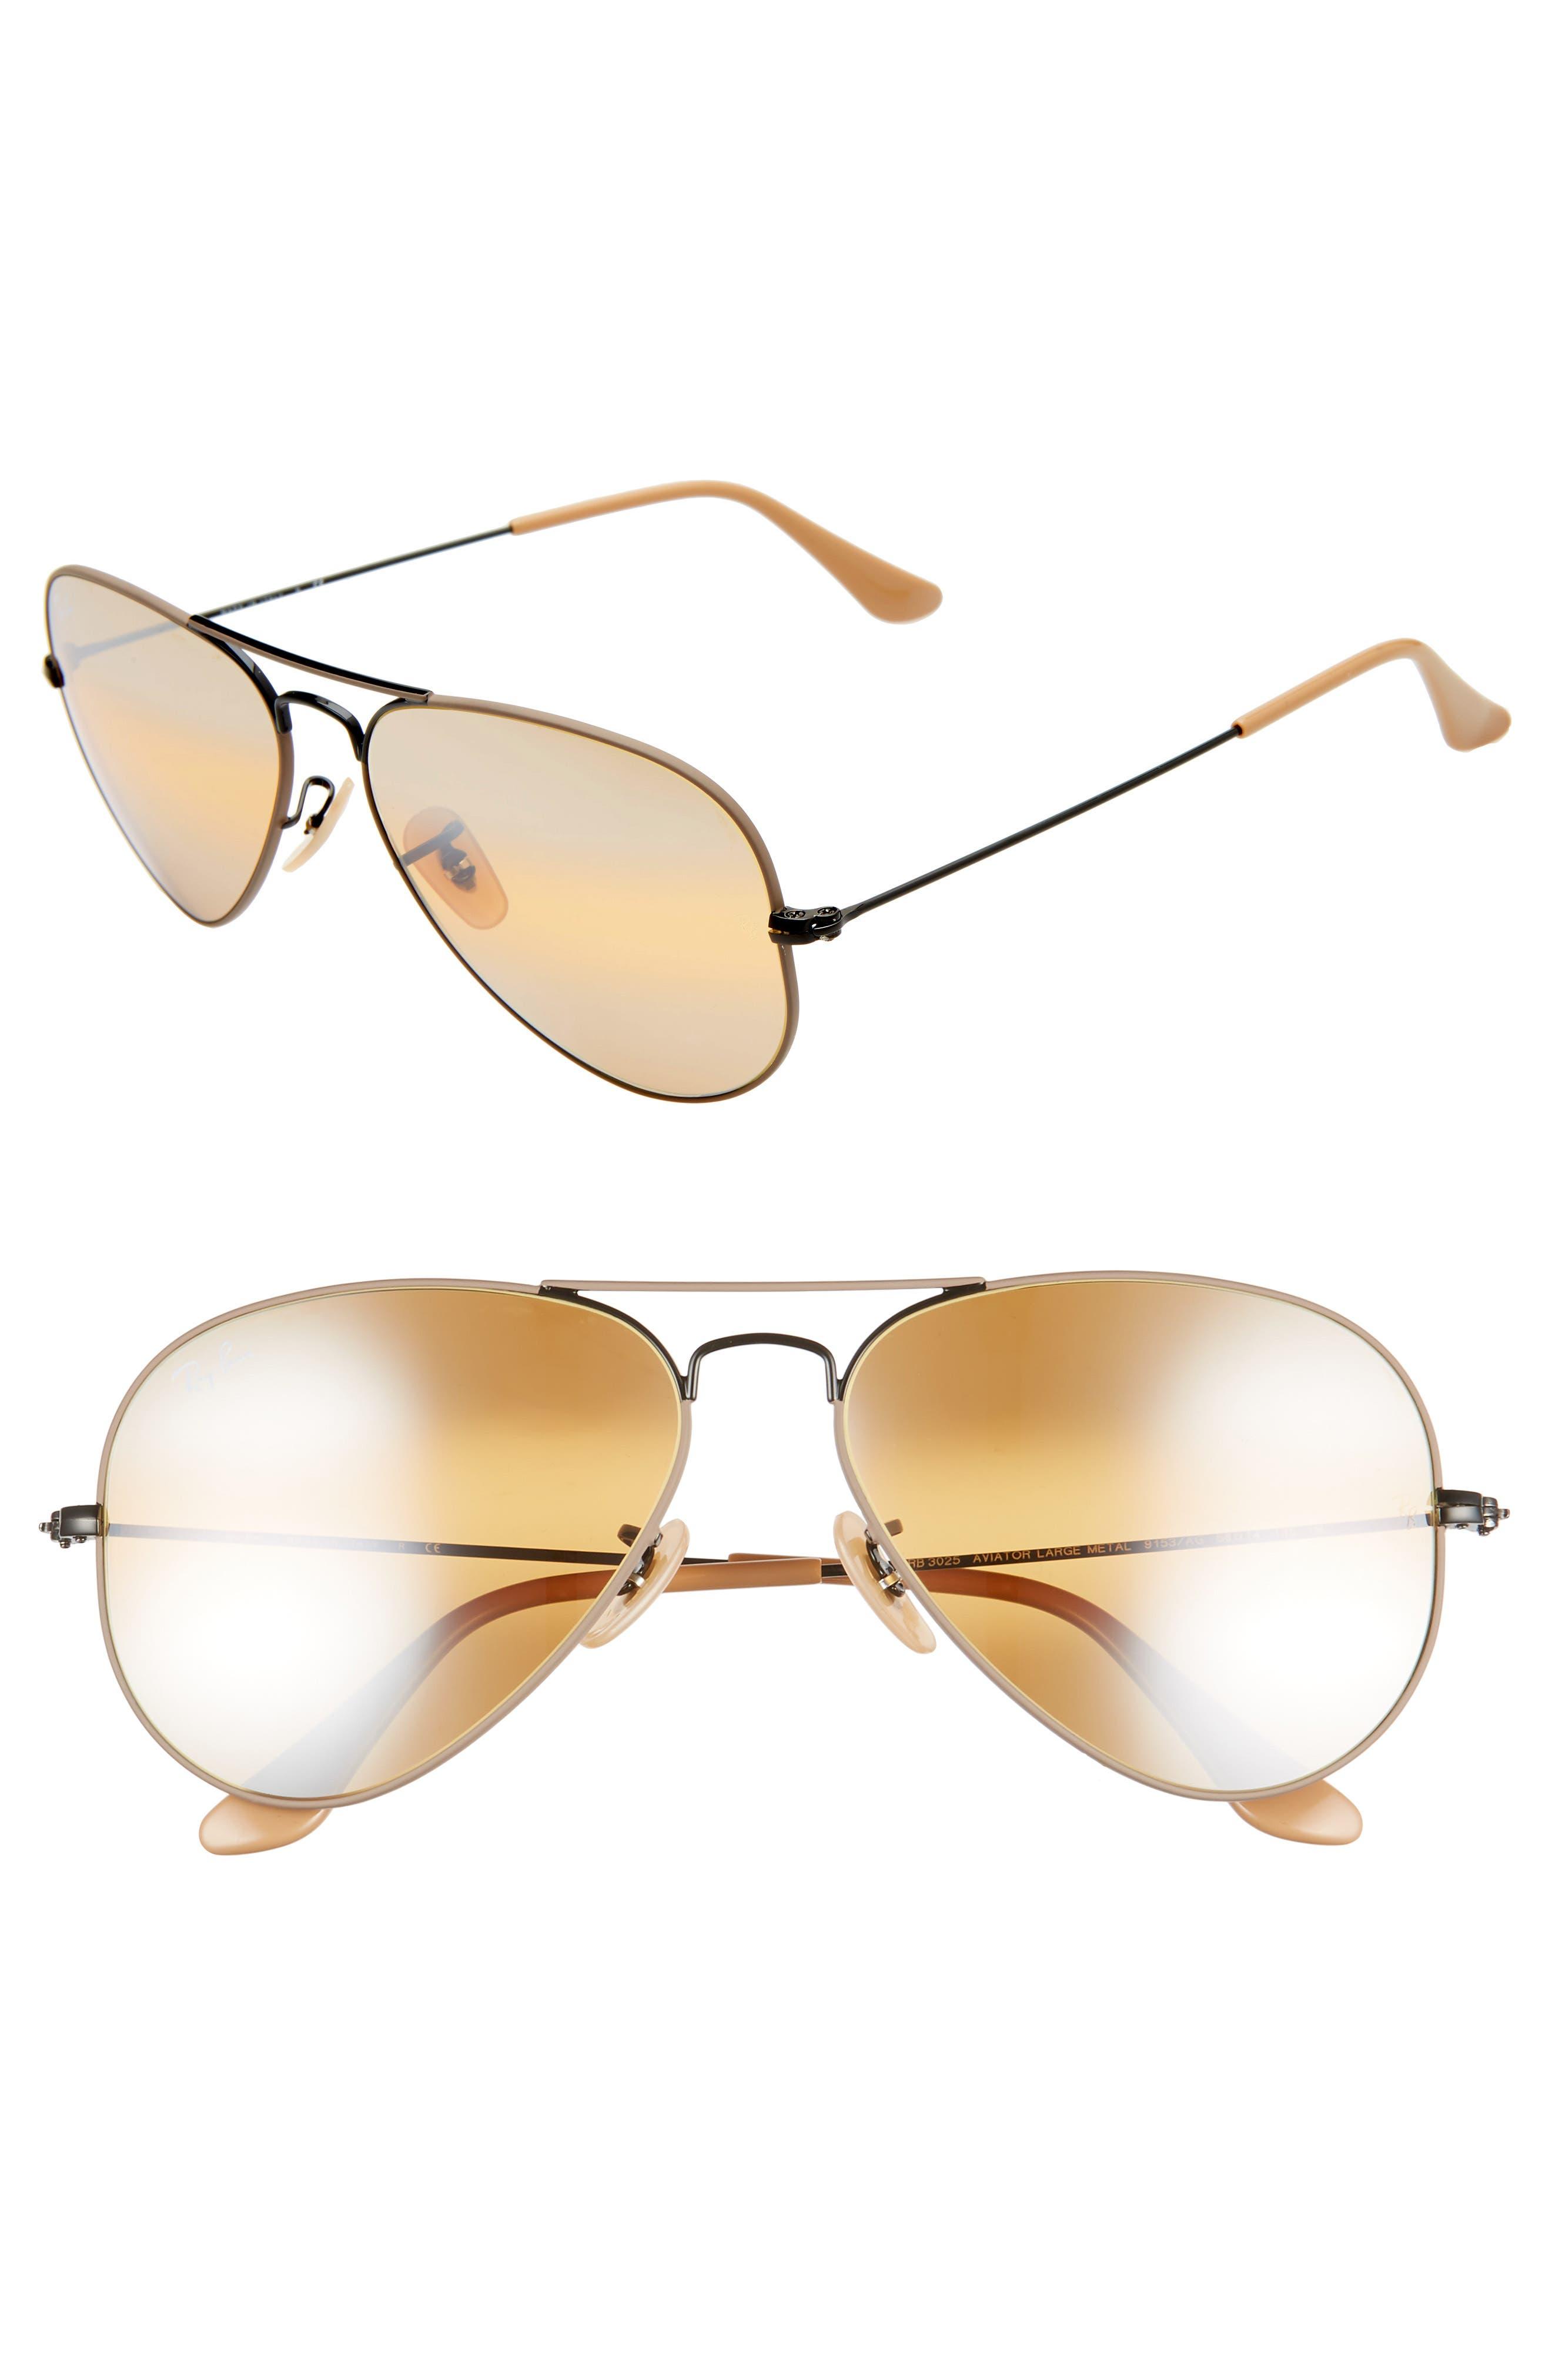 RAY-BAN,                             Standard Original 58mm Aviator Sunglasses,                             Main thumbnail 1, color,                             BEIGE/ BLACK MIRROR